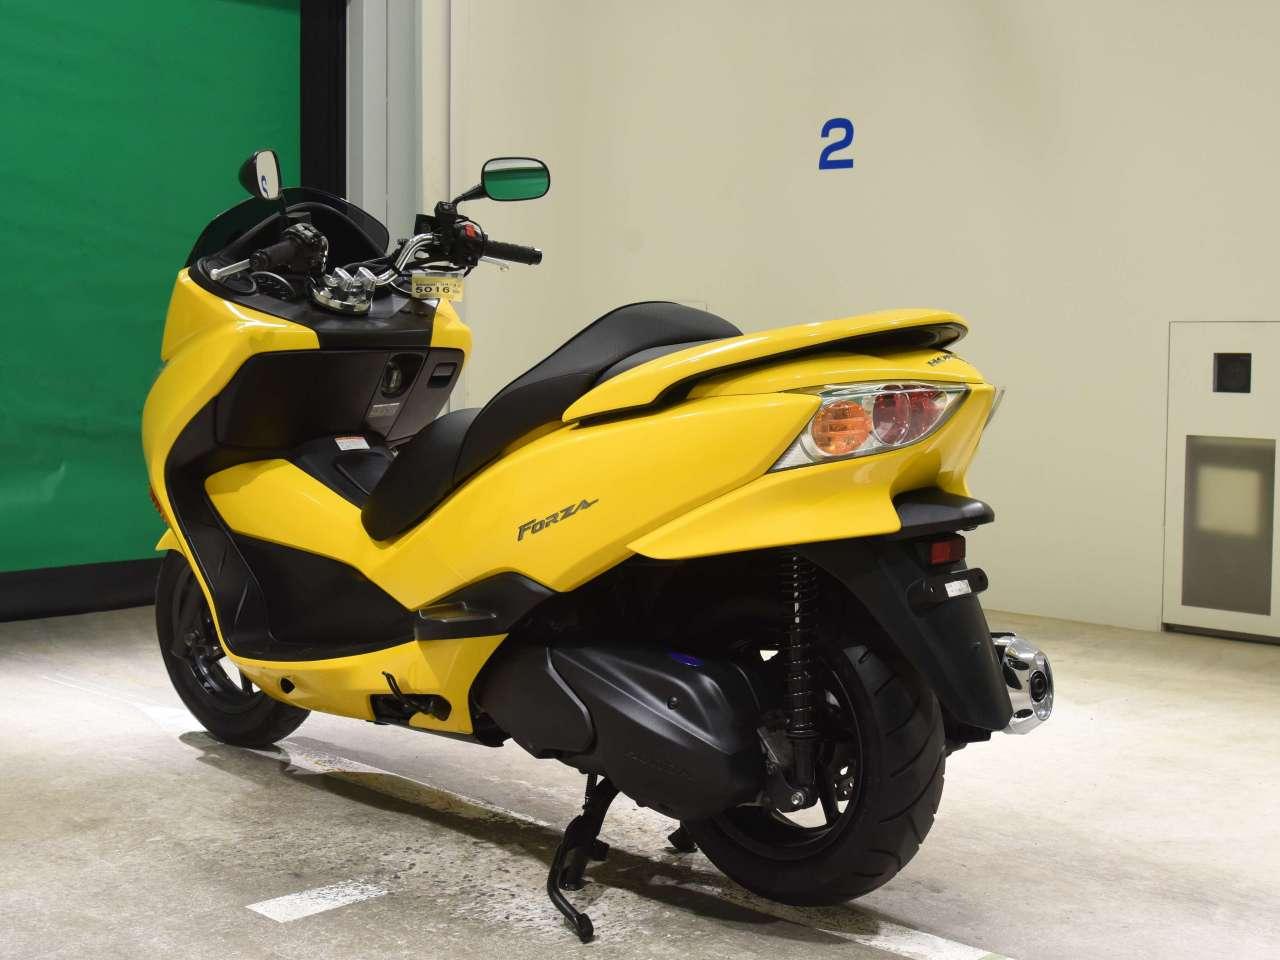 МАКСИ-СКУТЕР HONDA FORZA 250 MF10  Артмото - купить квадроцикл в украине и харькове, мотоцикл, снегоход, скутер, мопед, электромобиль